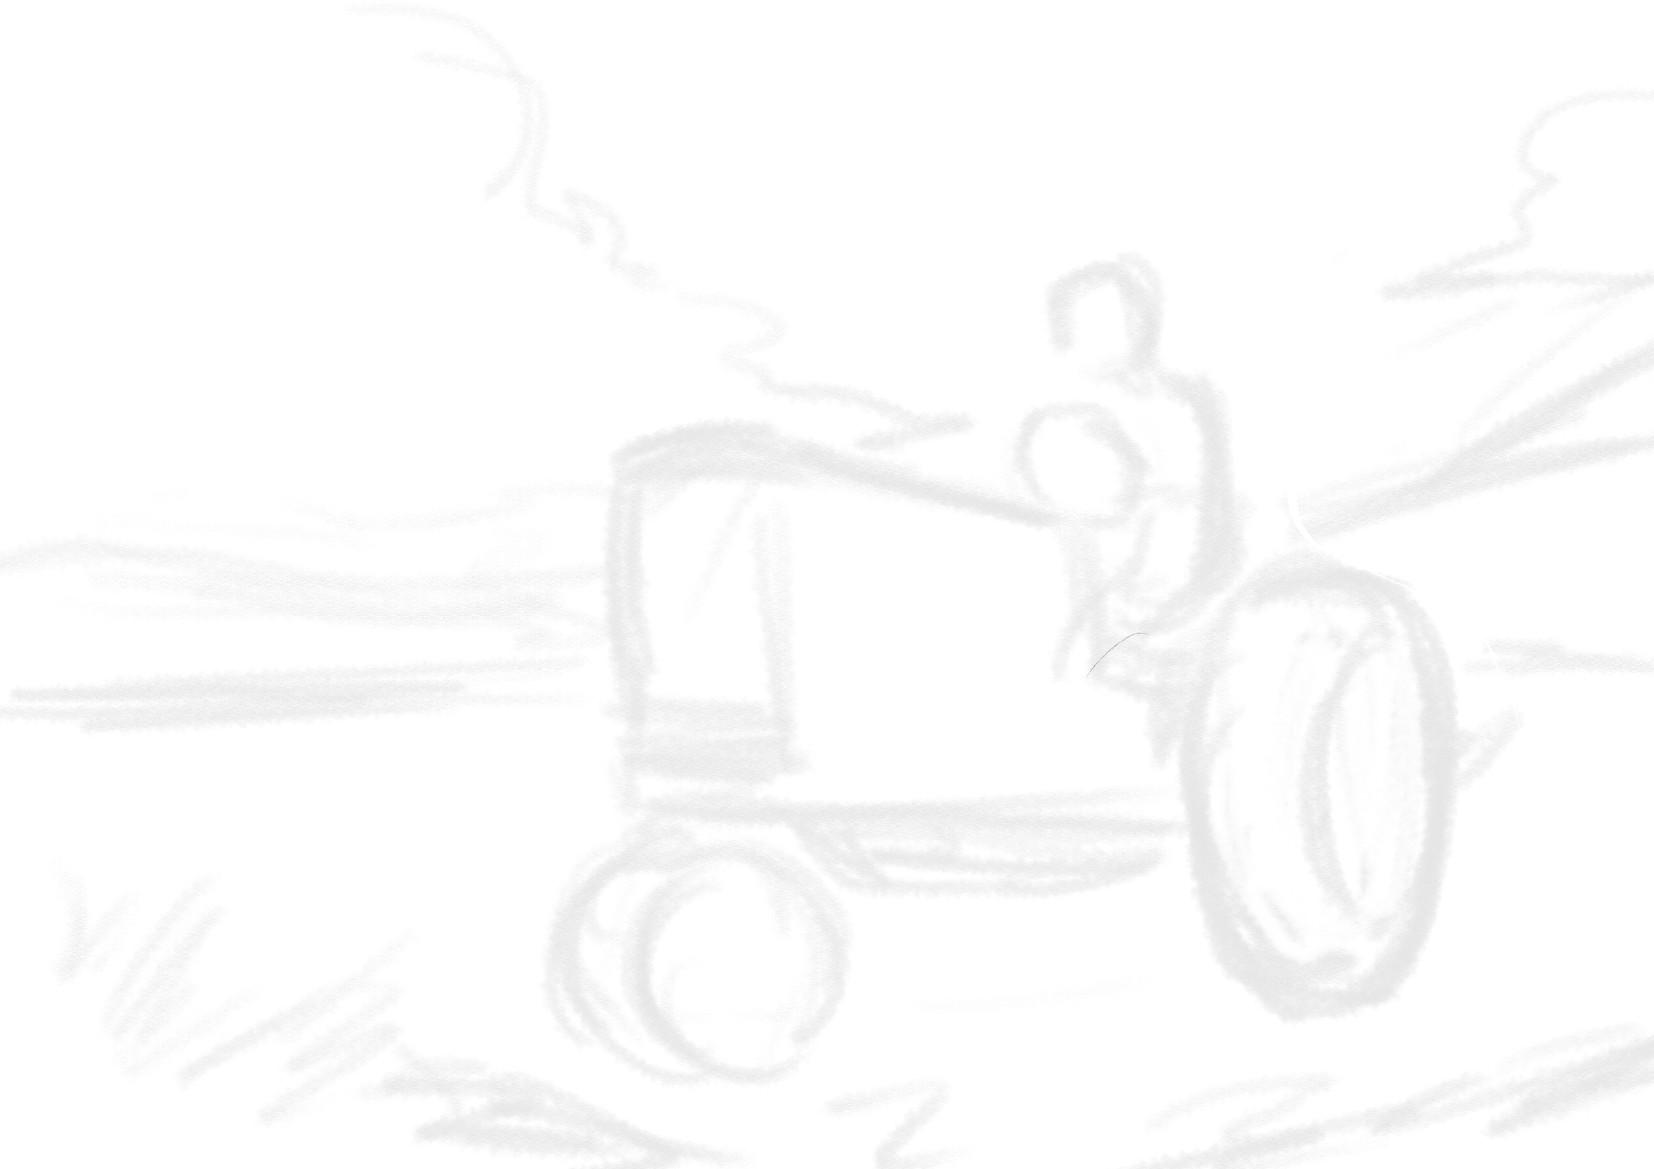 Tan kwang yang tanky tractor girl wip 01